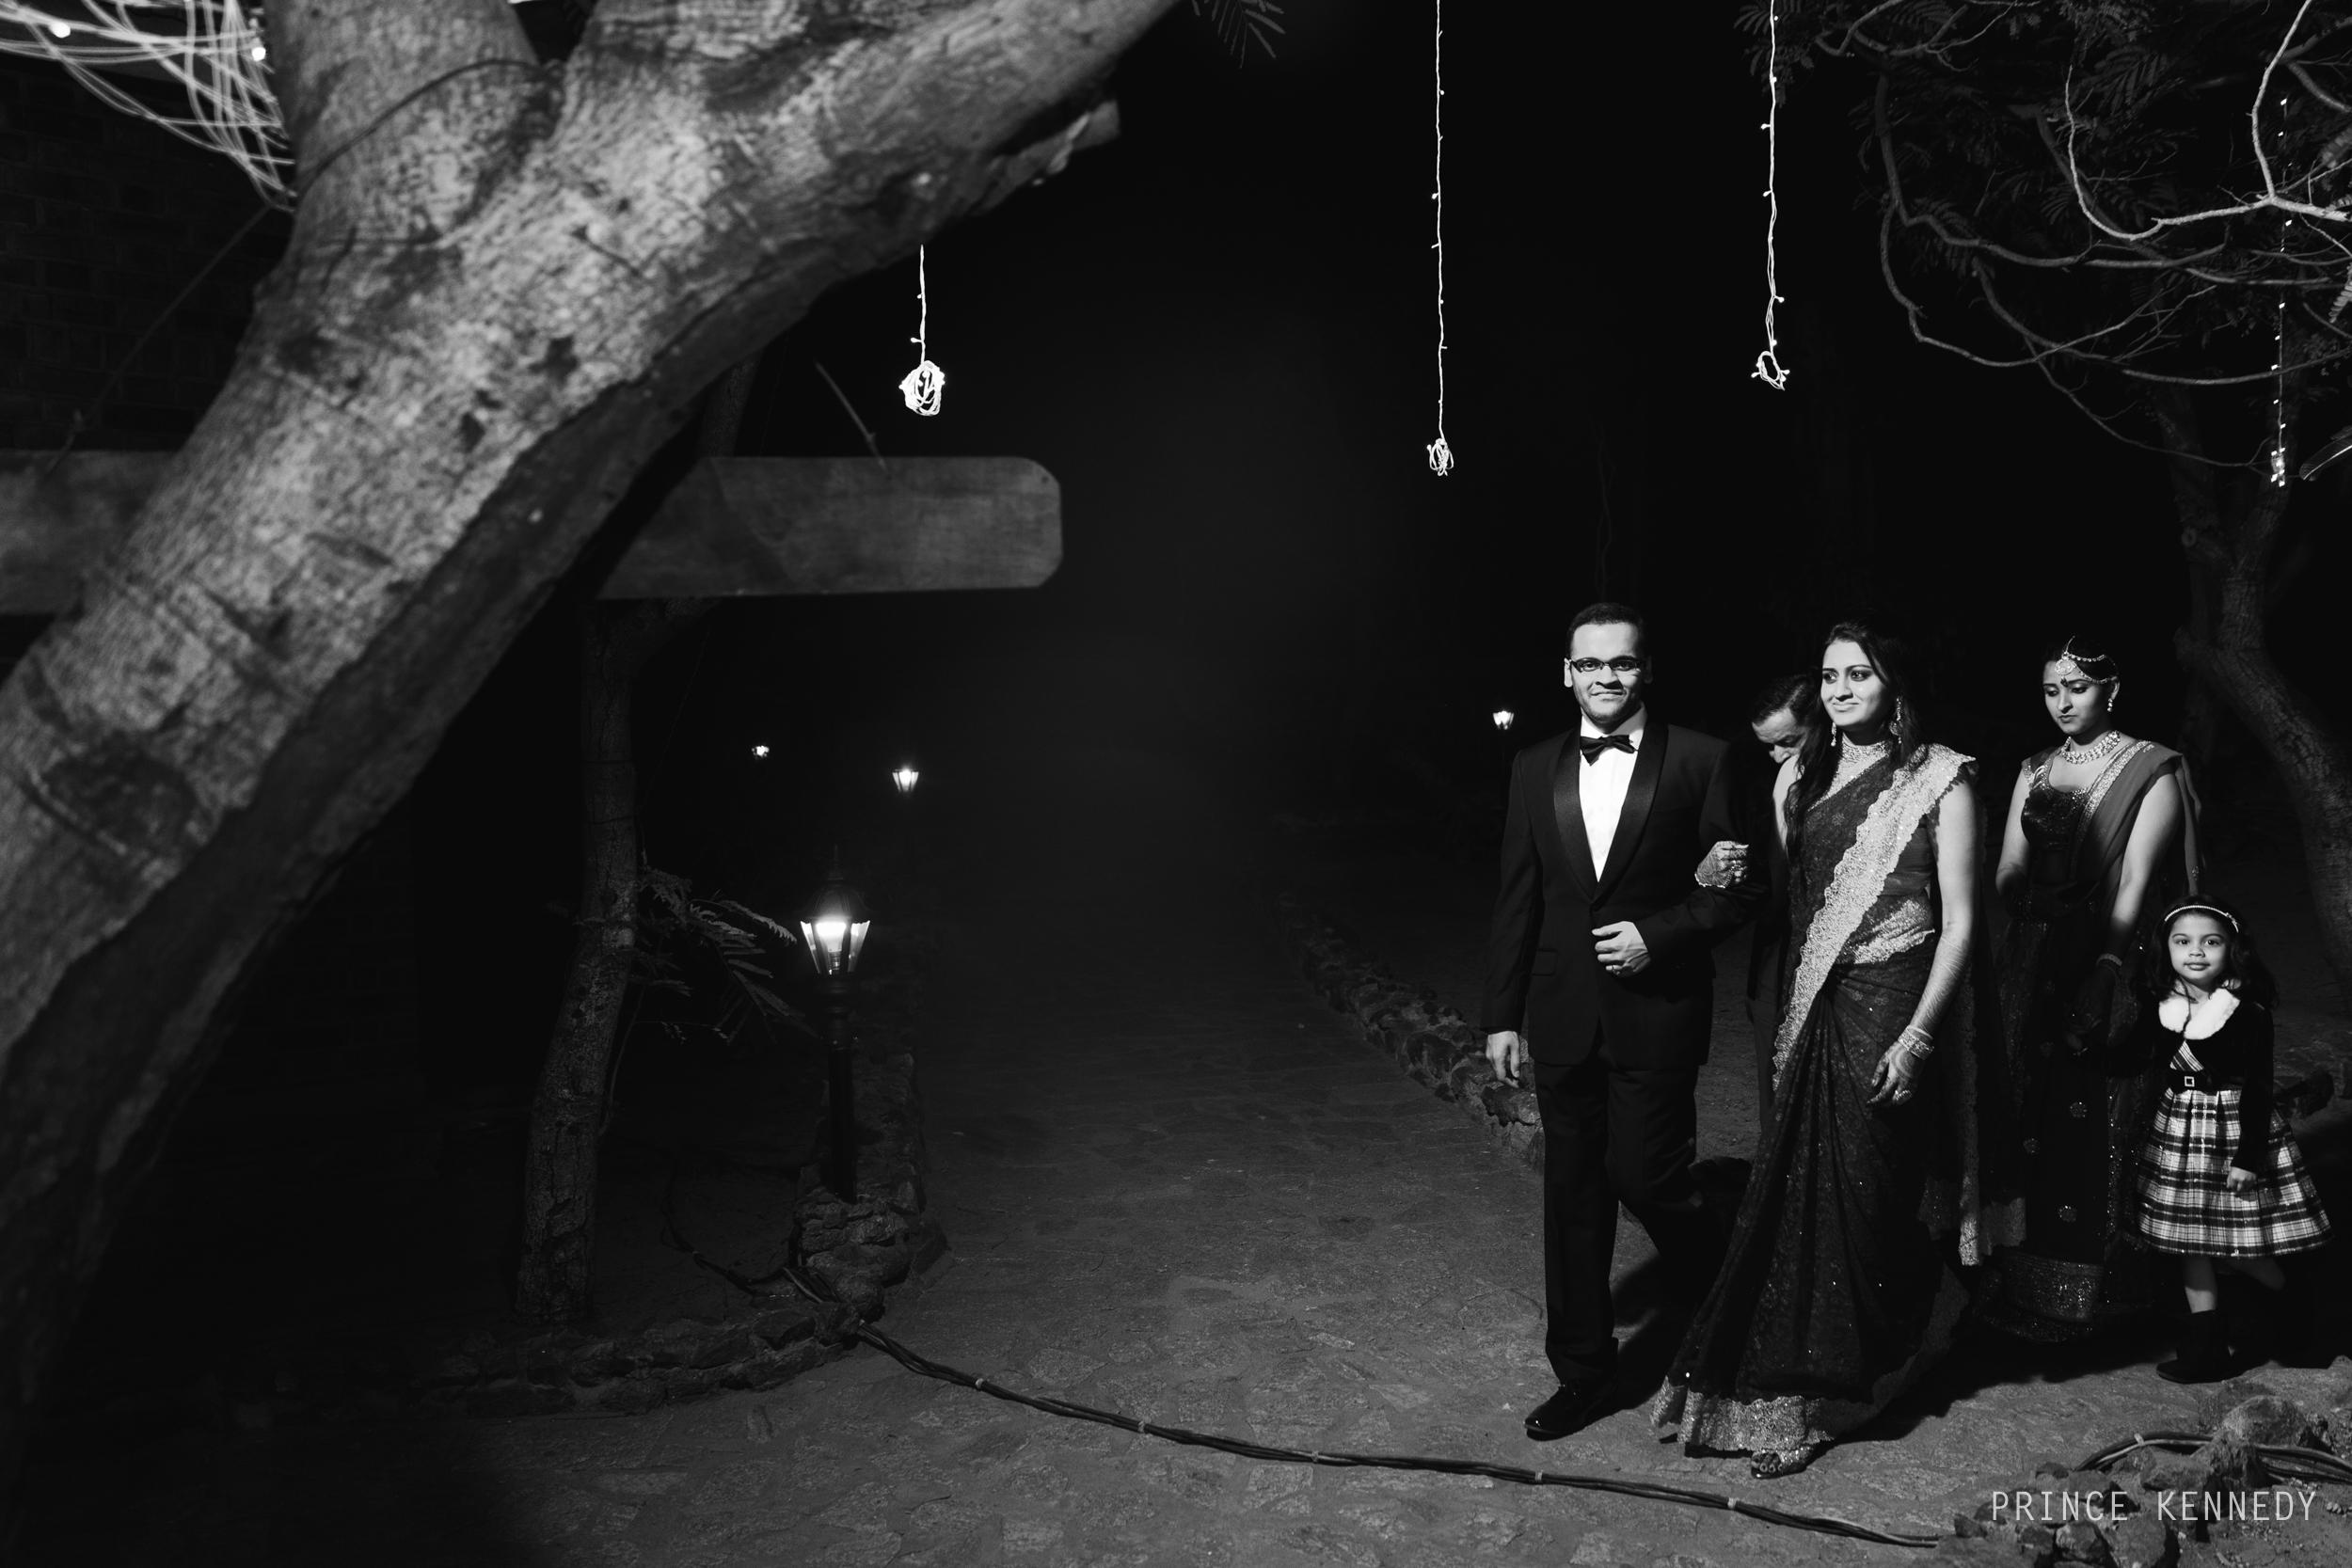 Athmajja-Nithesh-Engagement-Couple-Portrait-Portraiture-Wedding-Couple-Portrait-Chennai-Photographer-Candid-Photography-Destination-Best-Prince-Kennedy-Photography-66.jpg